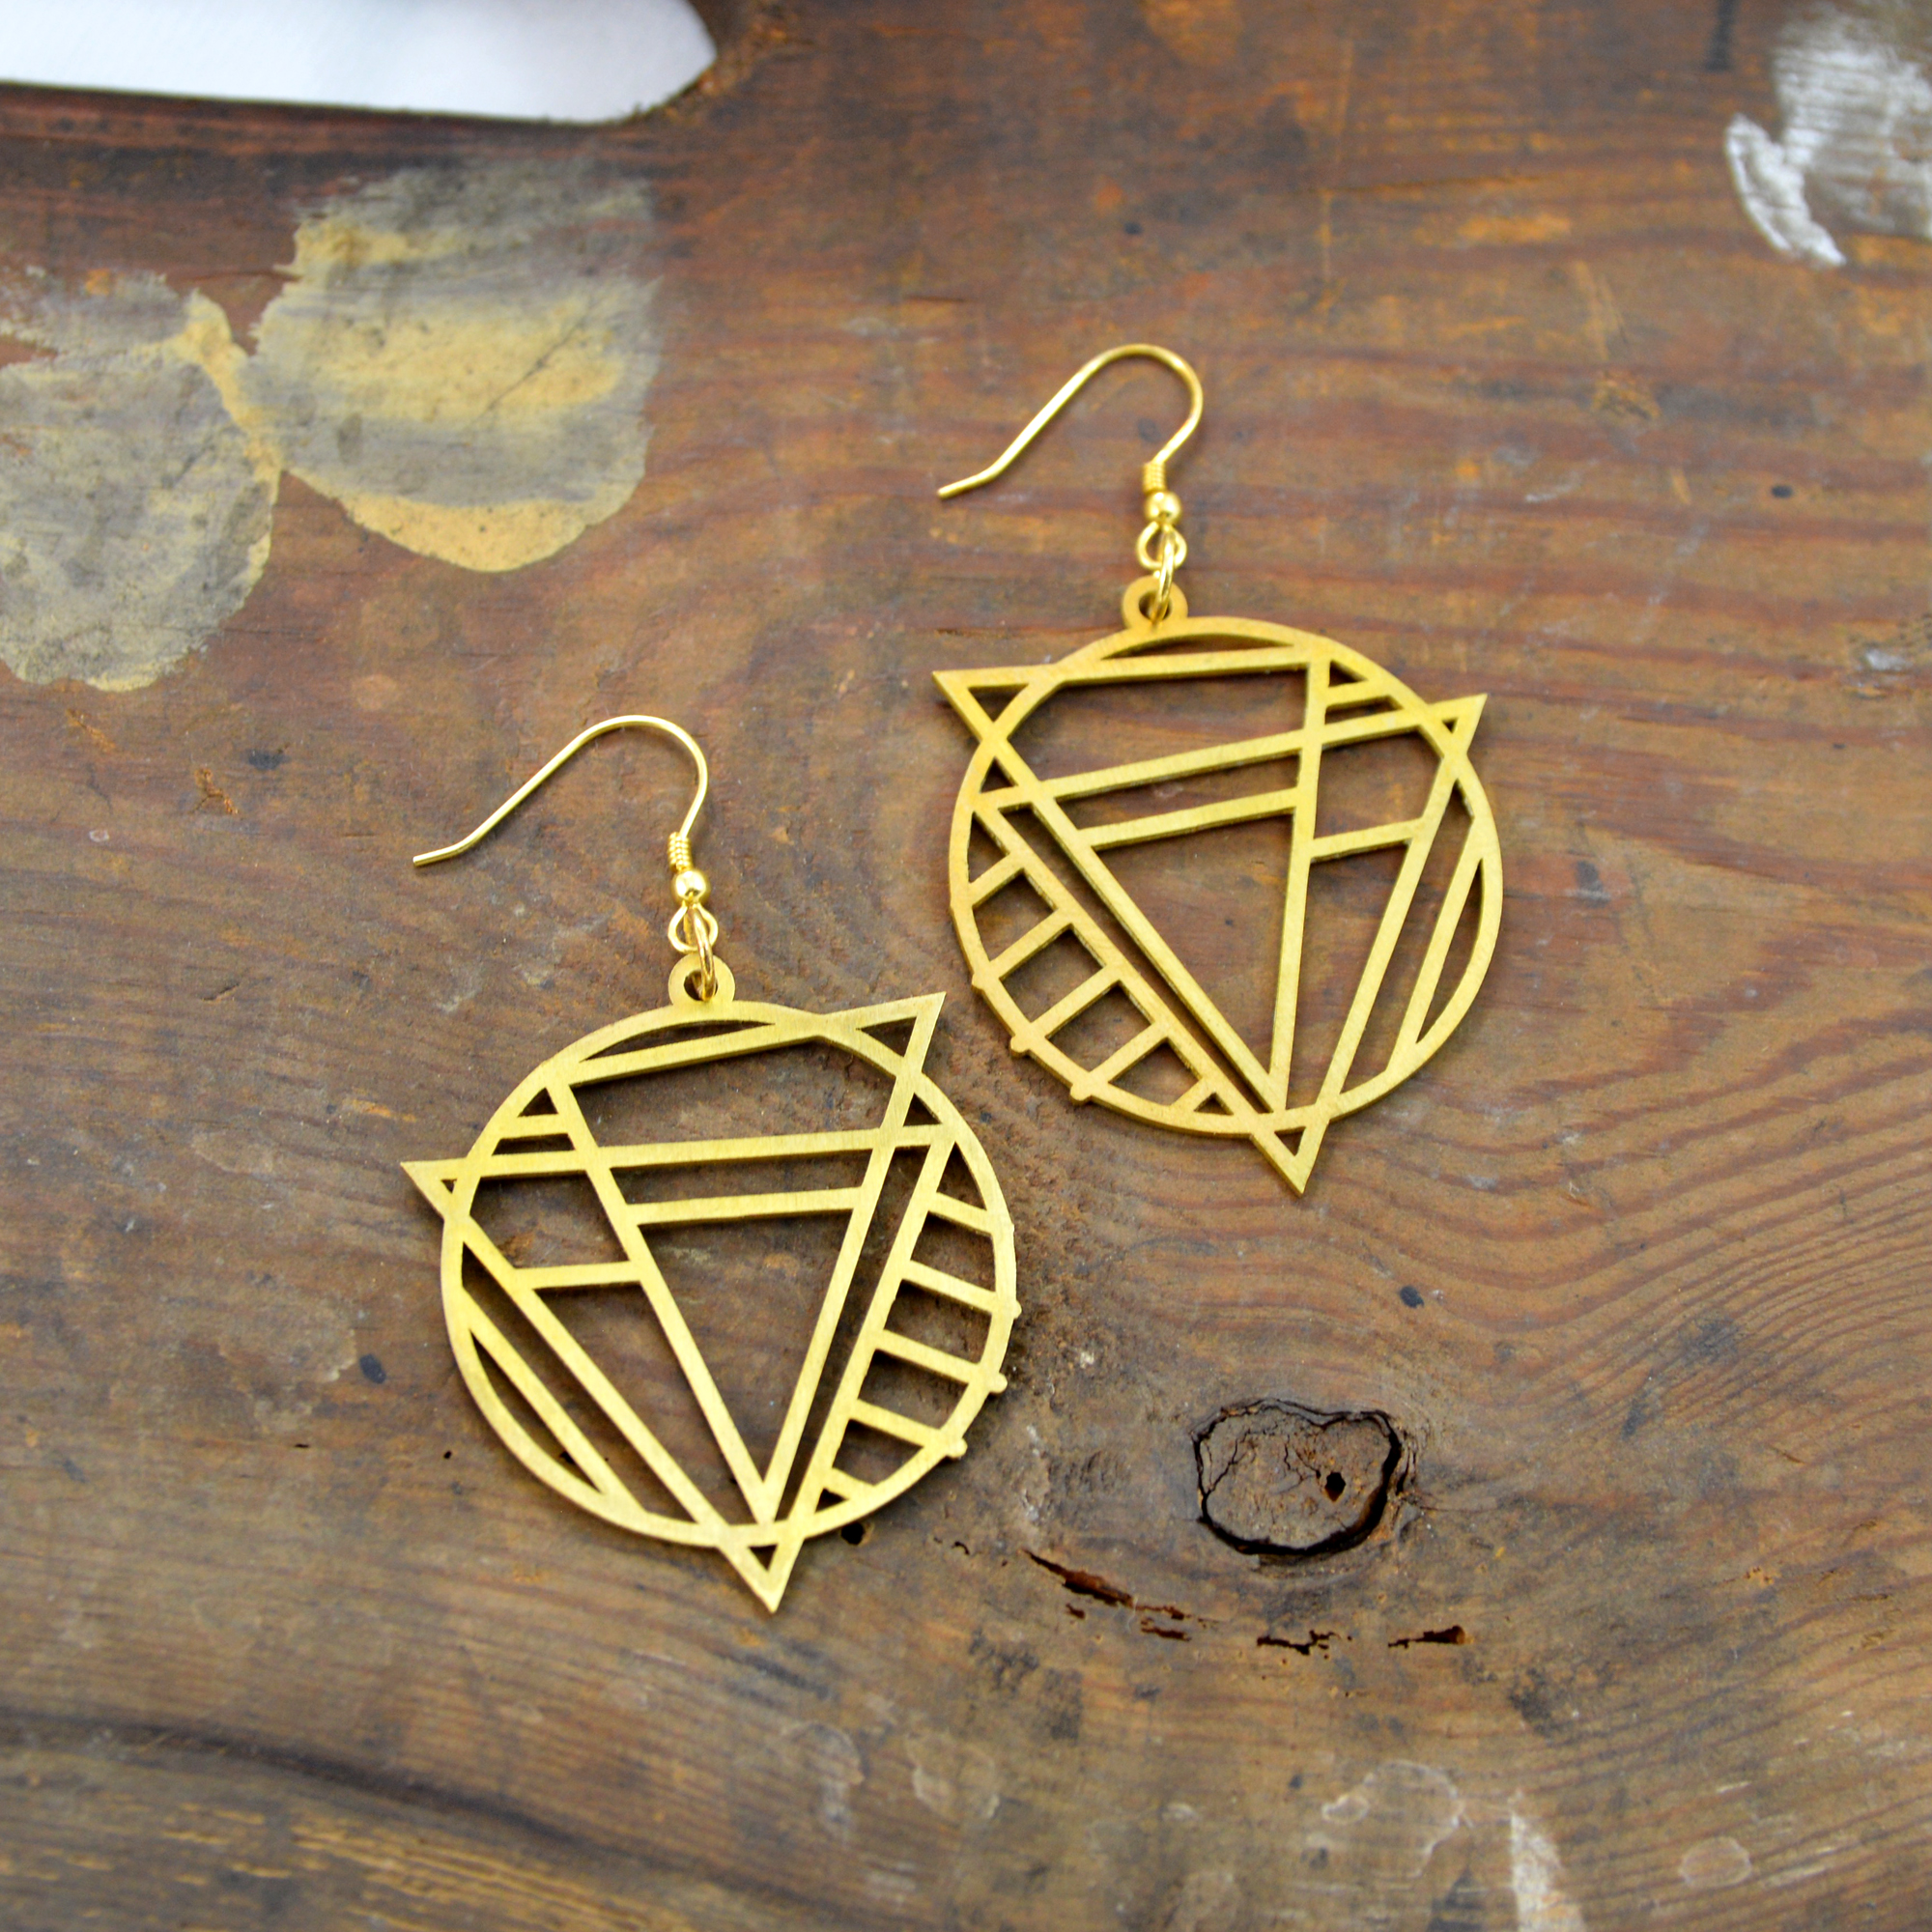 brass earrings made in buffalo ny gift shop